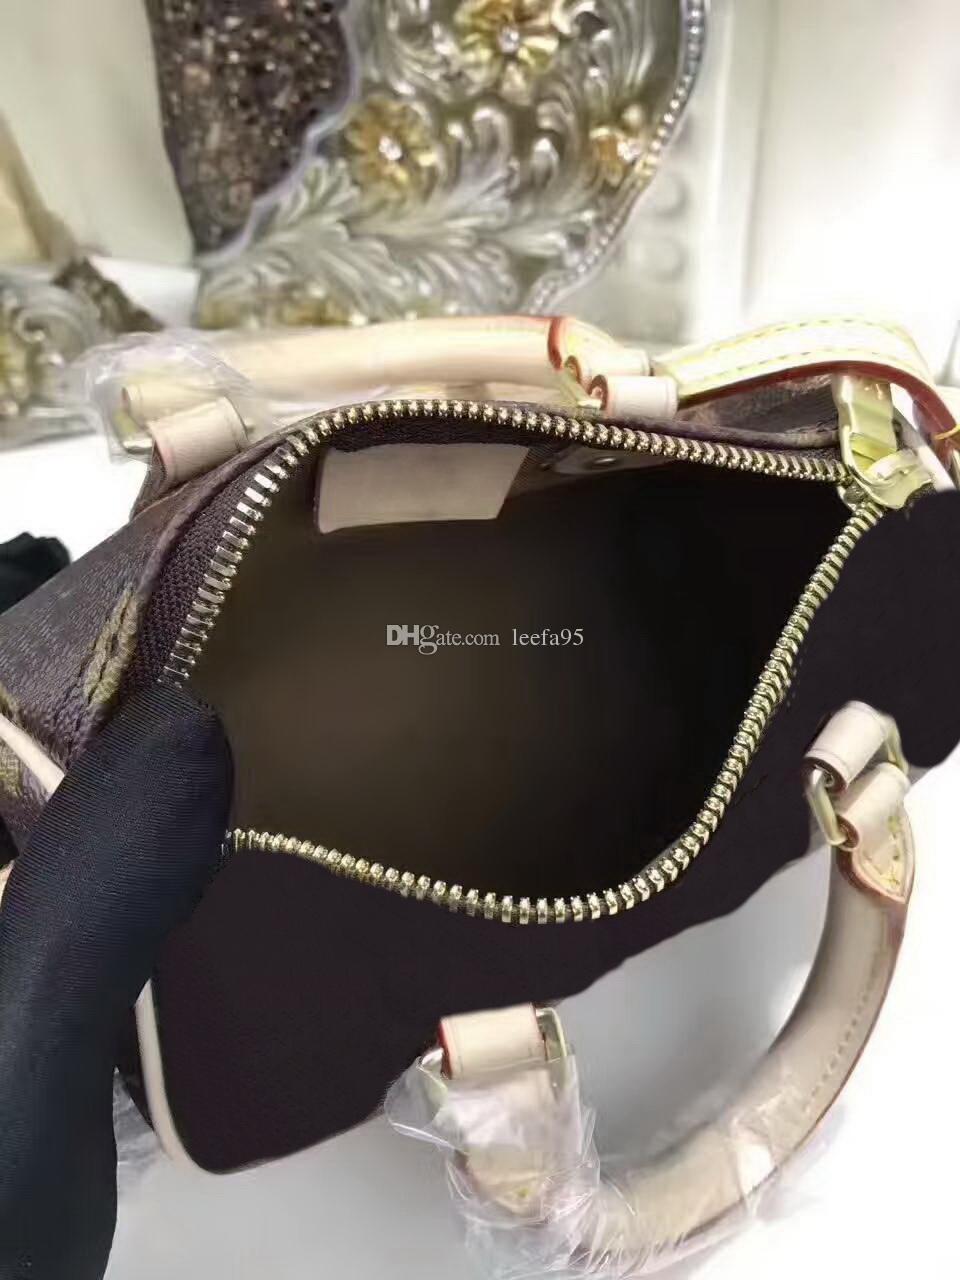 63ede108be13 Famous Women s Genuine Leather Handbags Mini Shoulder Totes Bag ...